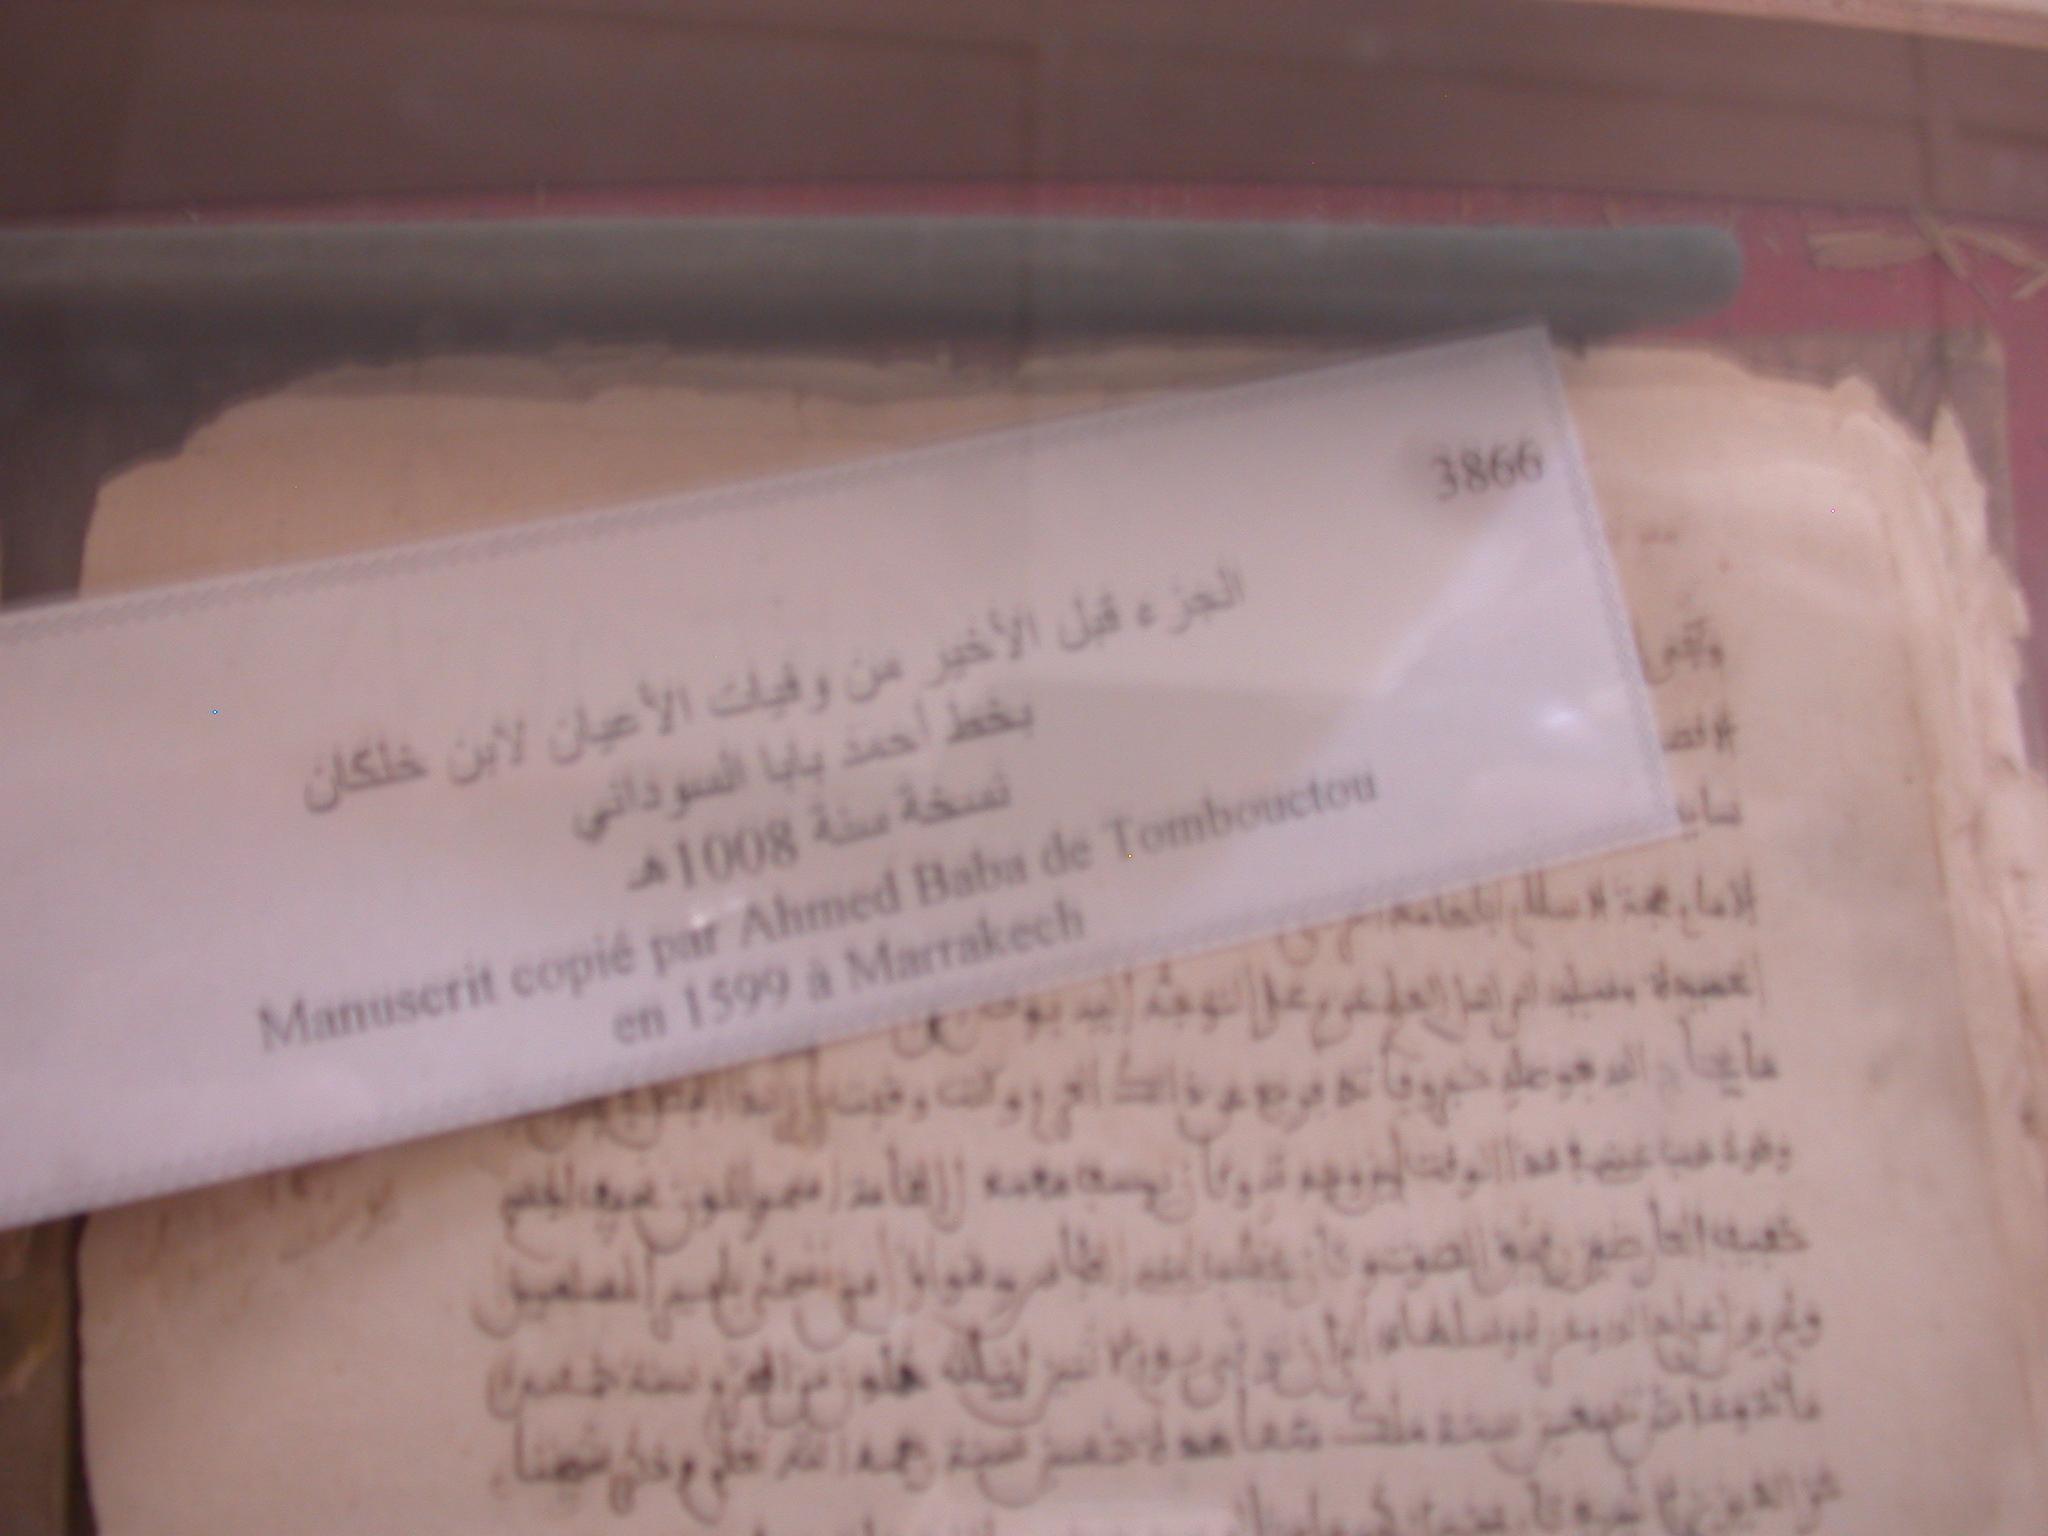 Manuscript Copied in Marrakesh in 1599 by Ahmad Baba of Timbuktu, Ahmed Baba Institute, Institut des Hautes Etudes et de Recherches Islamiques, Timbuktu, Mali